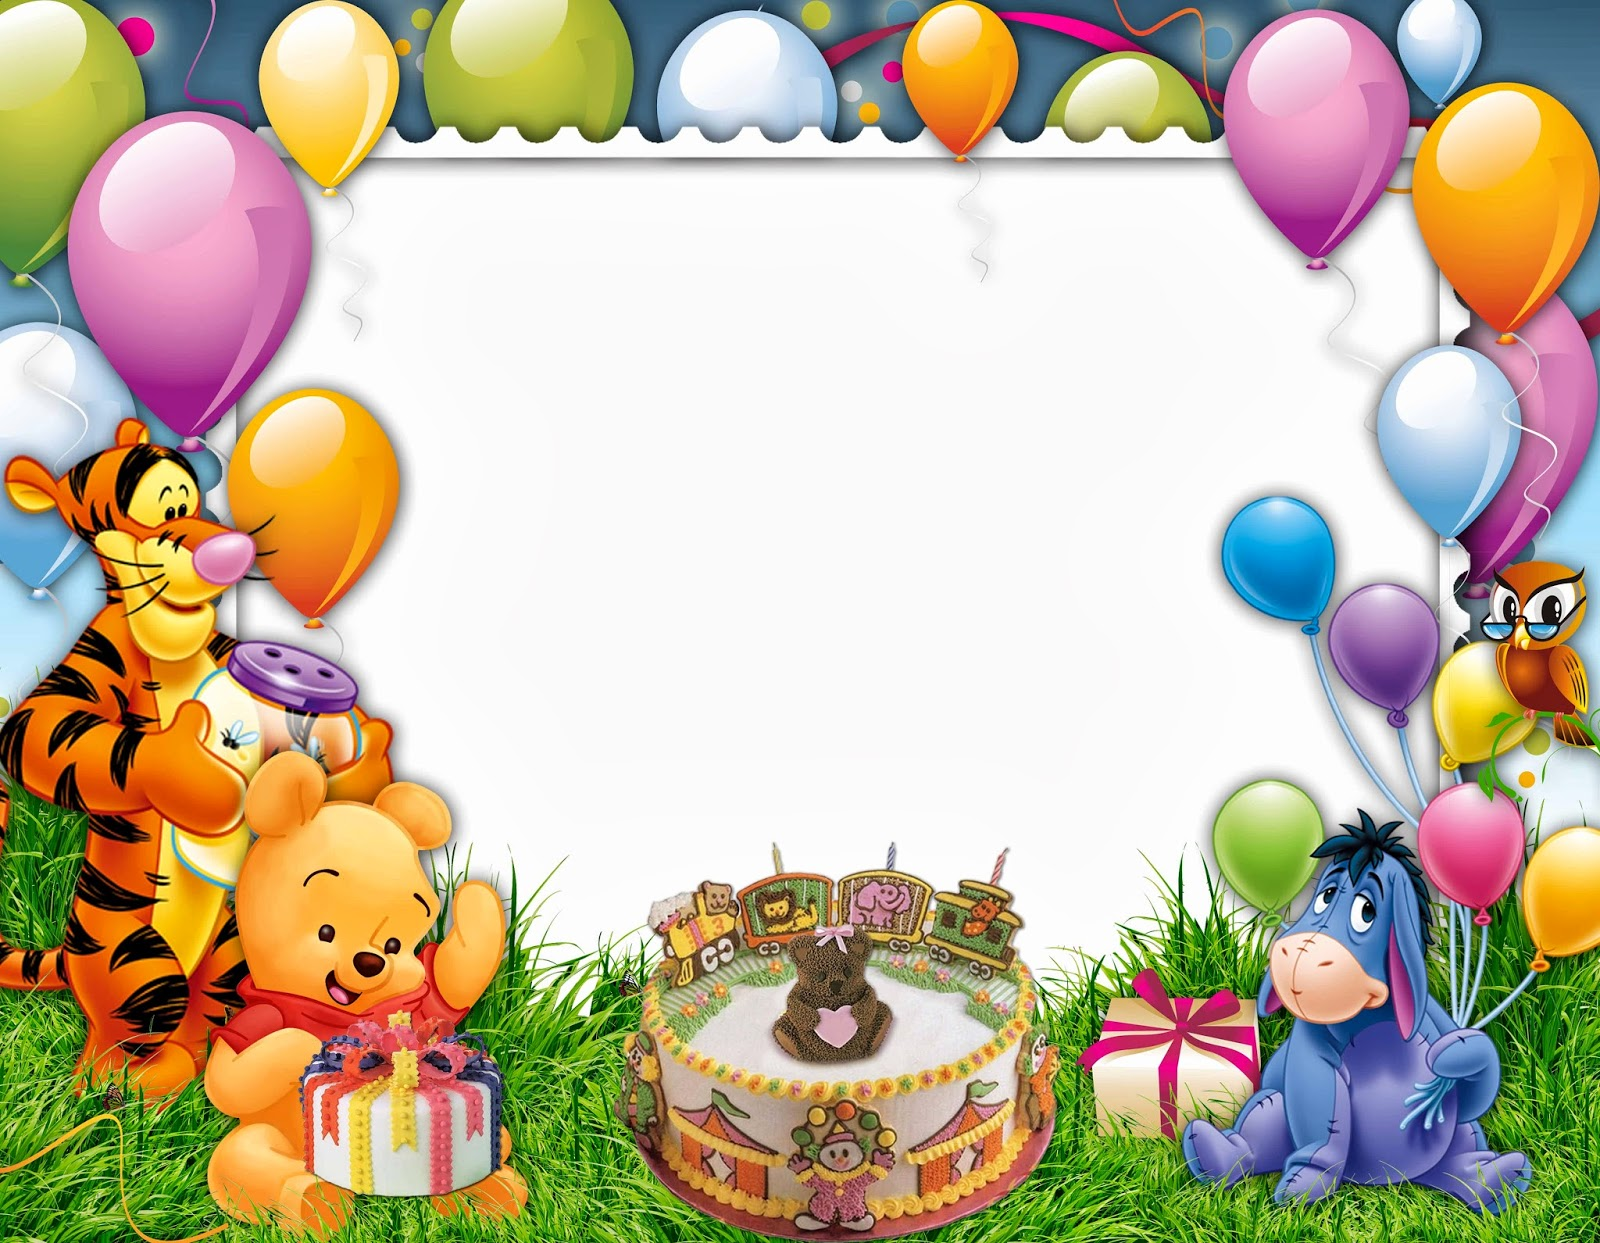 11 Baby Birthday Background PSD Images - Free Birthday PSD ...